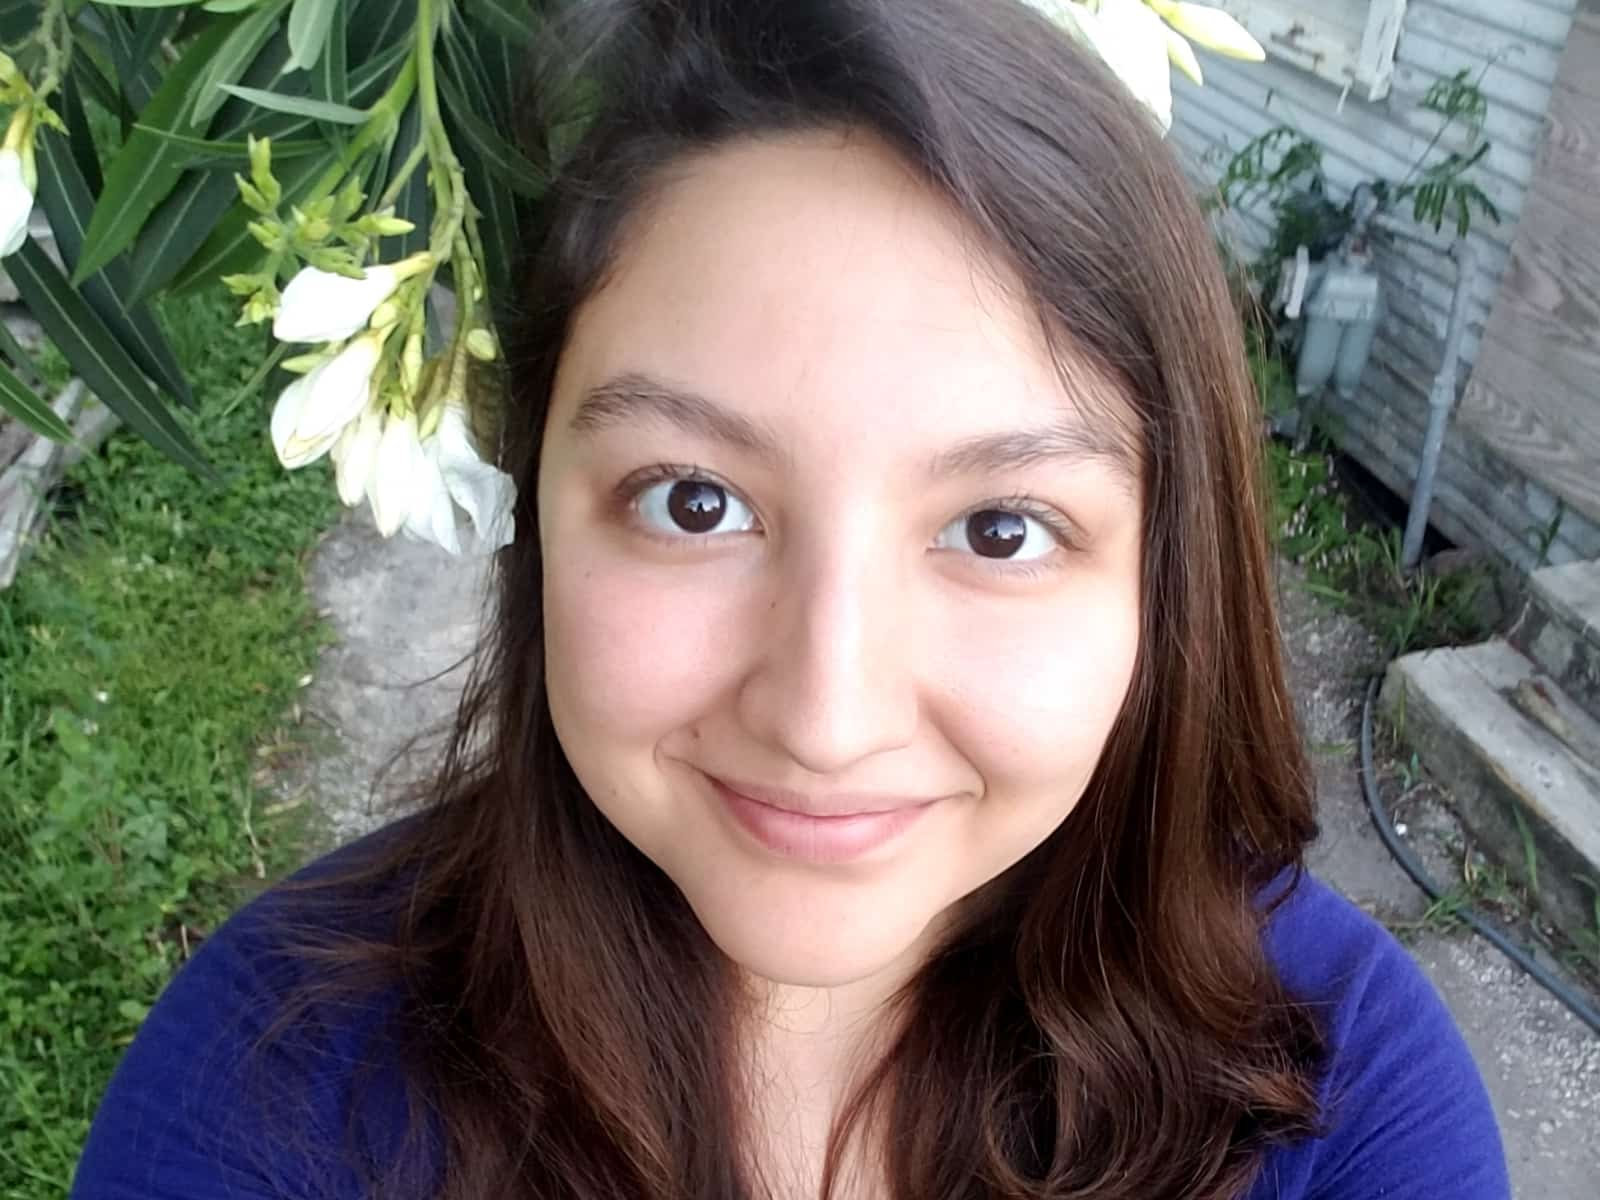 Sinthiana from Corpus Christi, Texas, United States